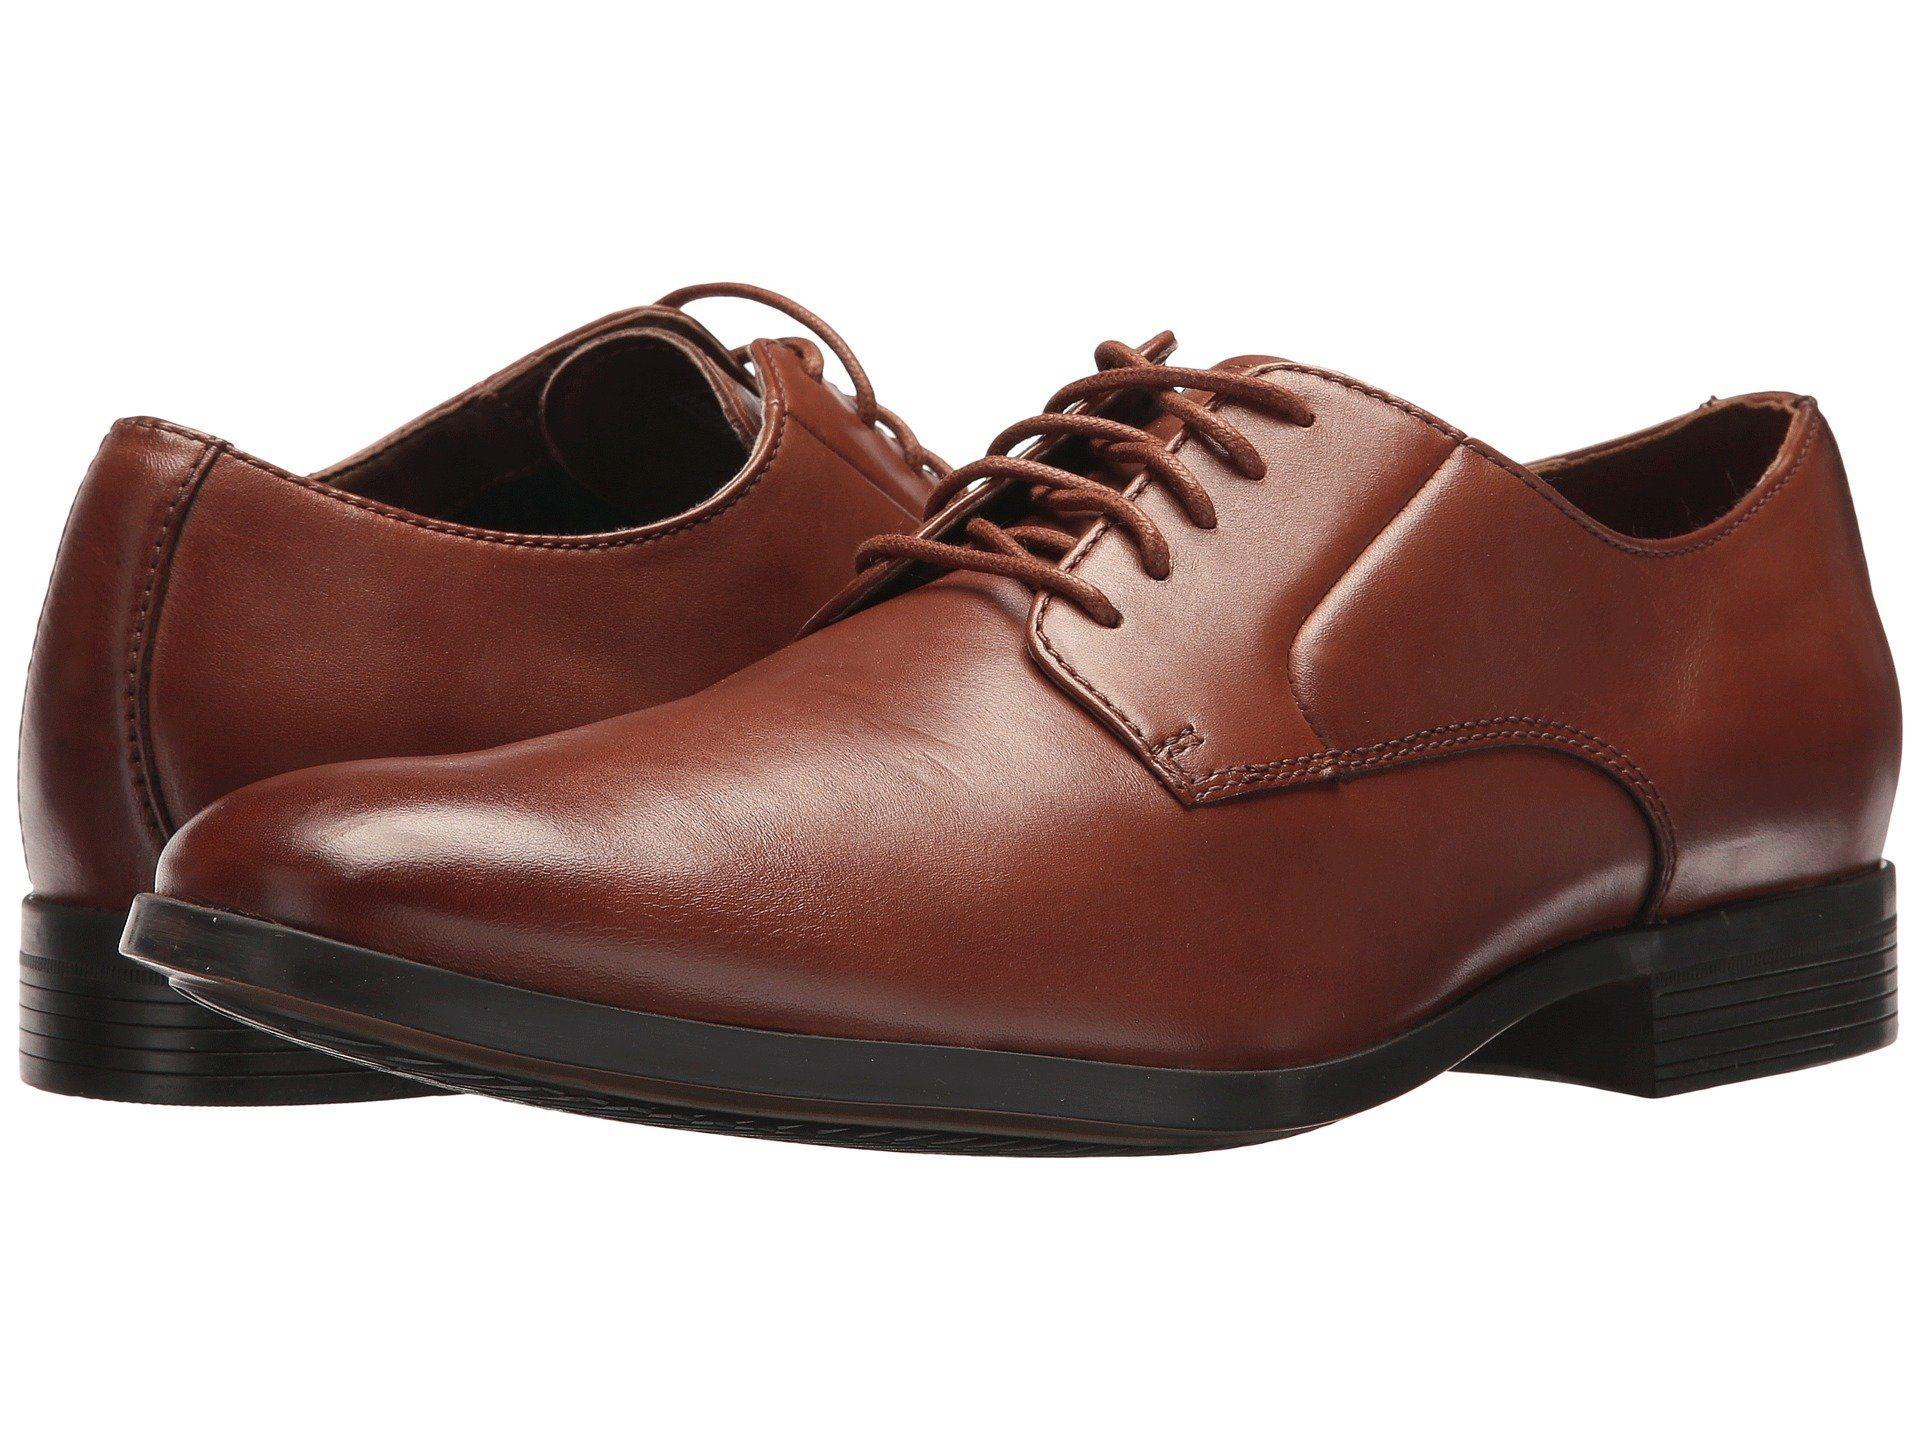 cf34b7ea93d7 CLARKS Conwell Cap.  clarks  shoes